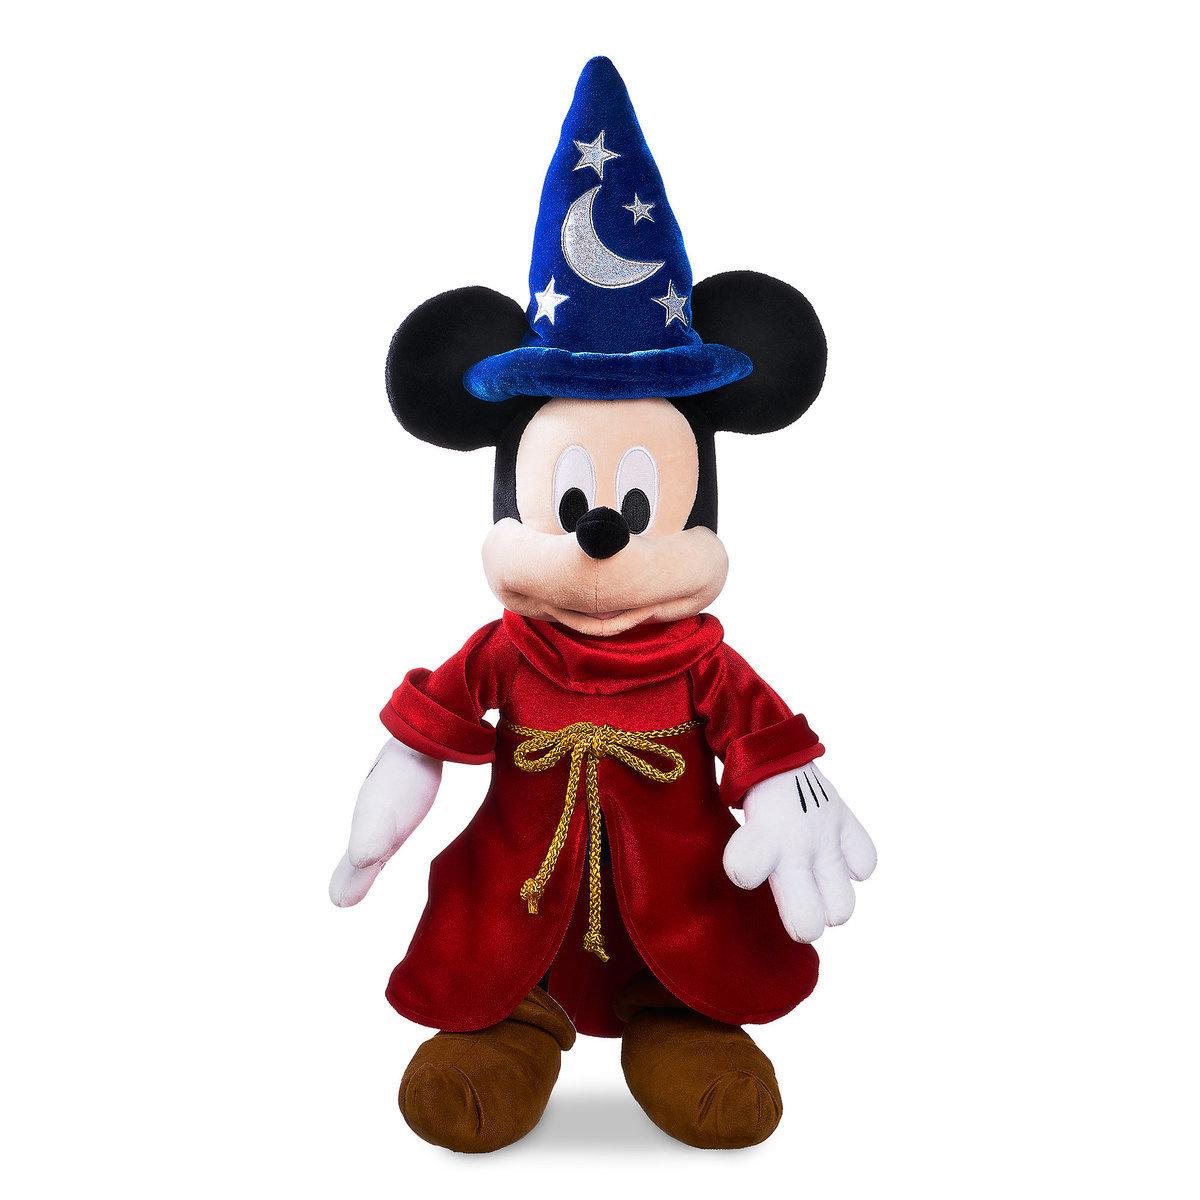 Мягкая игрушка «Волшебник Микки Маус» 56 см